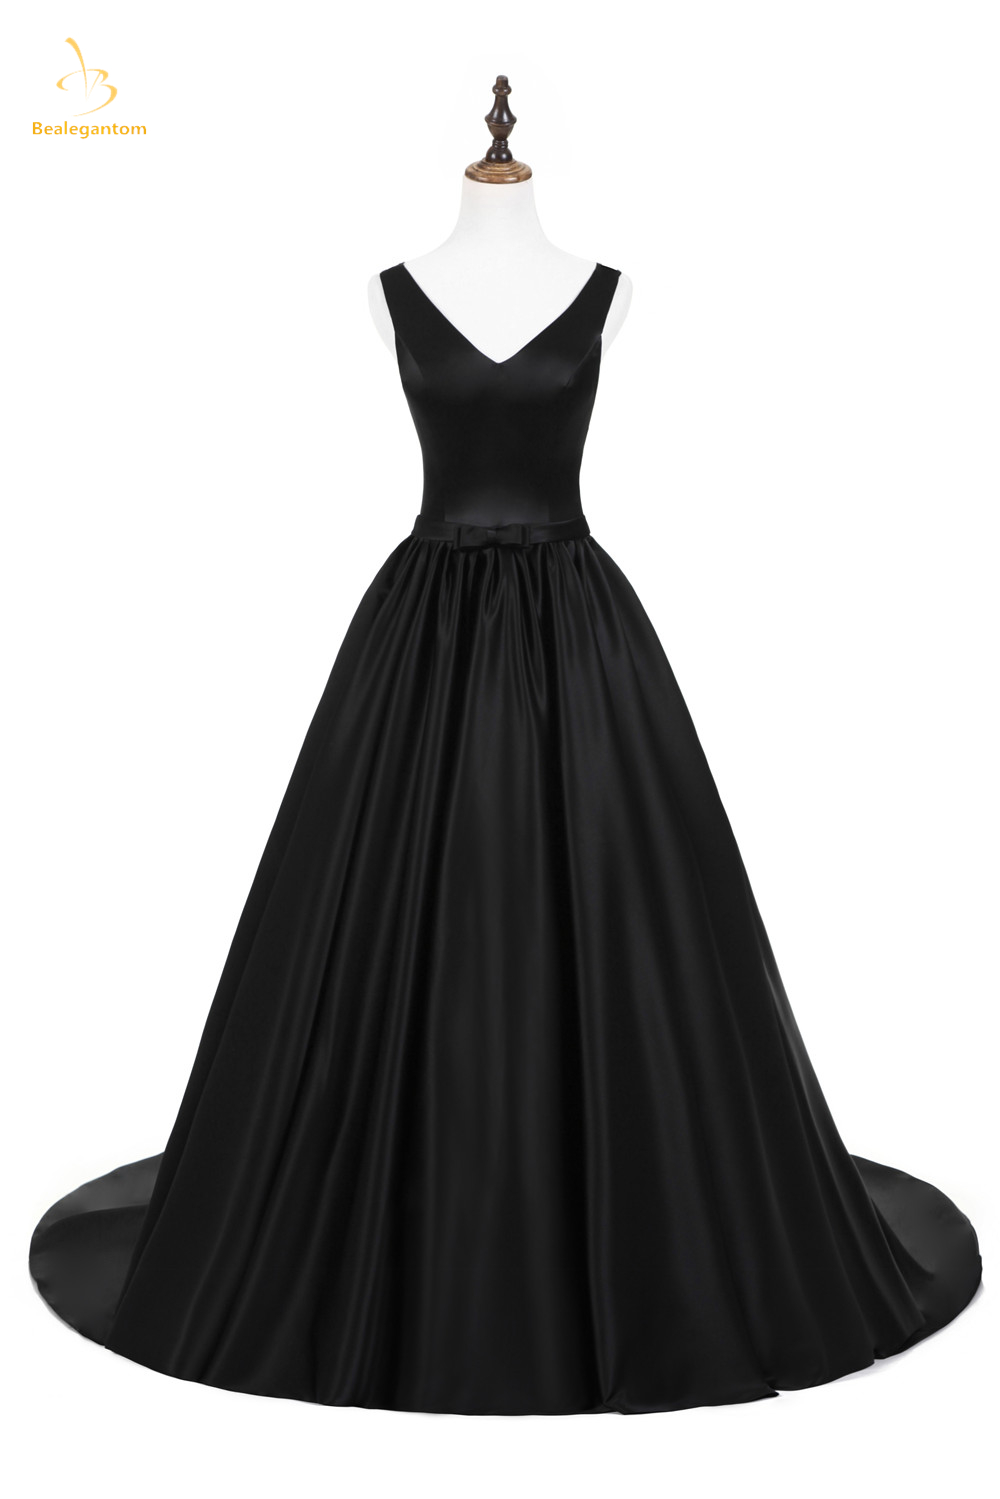 US $74.99 40% OFF|Bealegantom 2019 Elegant 100% Real Photo Black V Neck  Long Prom Dresses Beaded Plus Size Formal Evening Party Gown QA1580-in Prom  ...